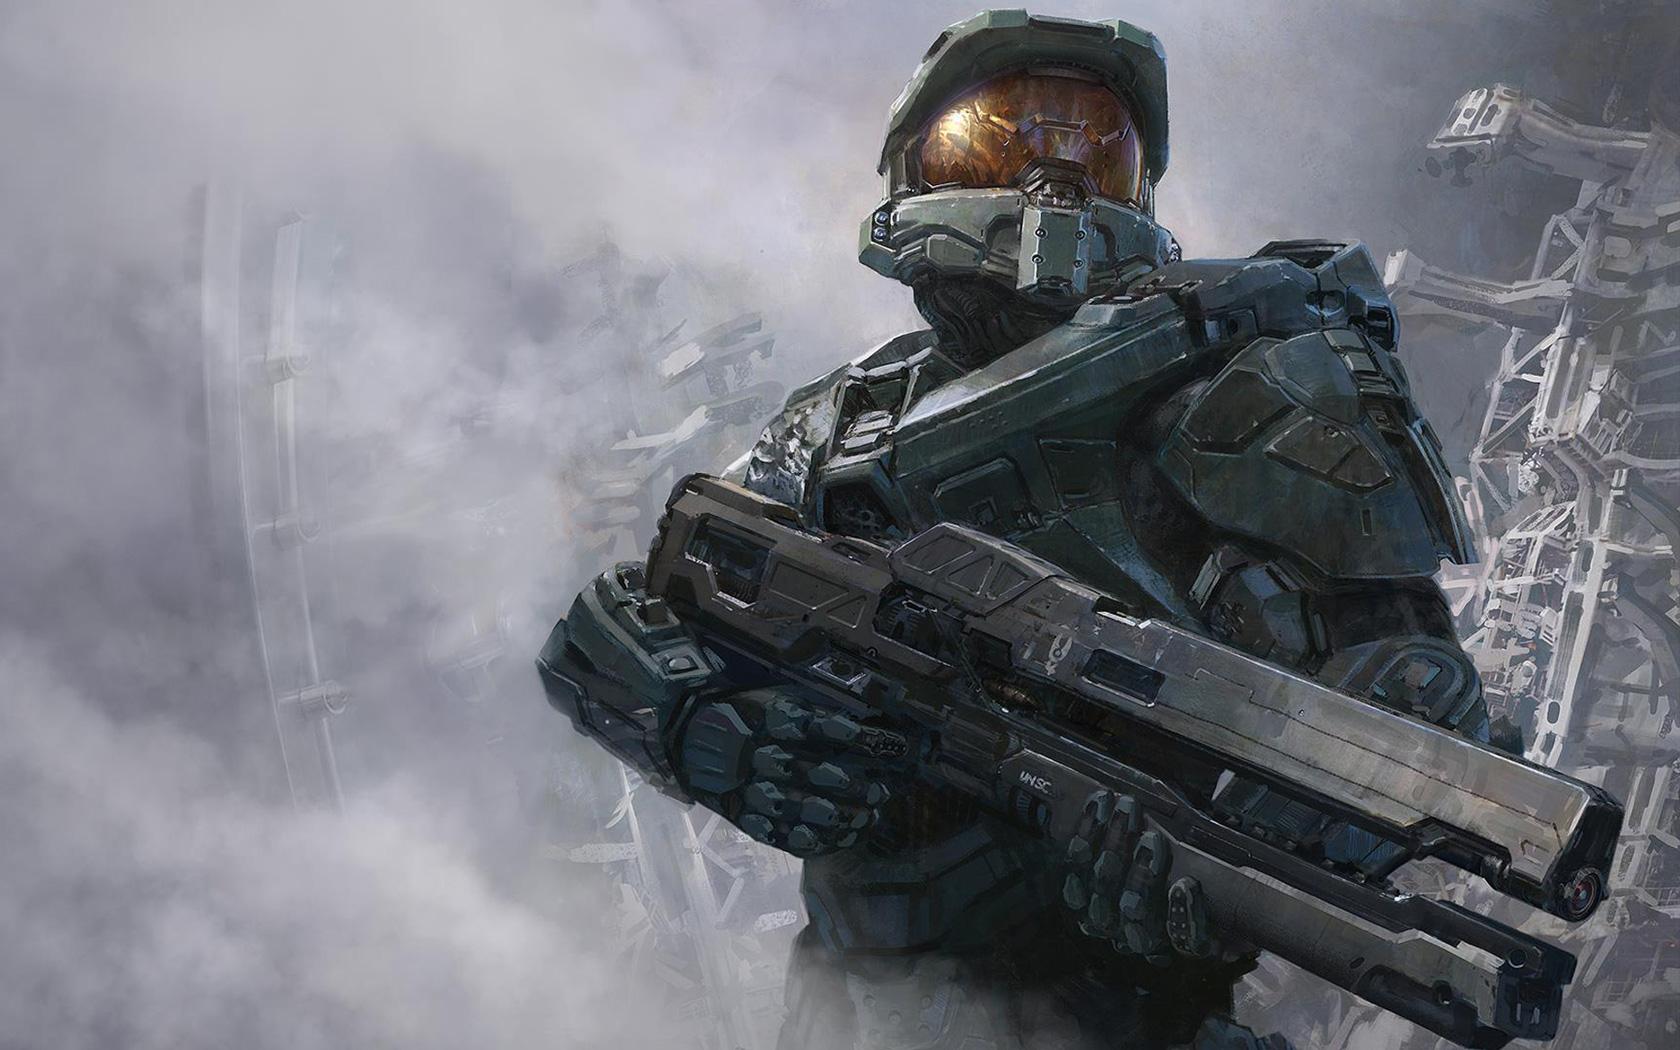 Batman Arkham Asylum Battlefield Halo 4 Wallpaper 1080p Wallpaper 1680x1050